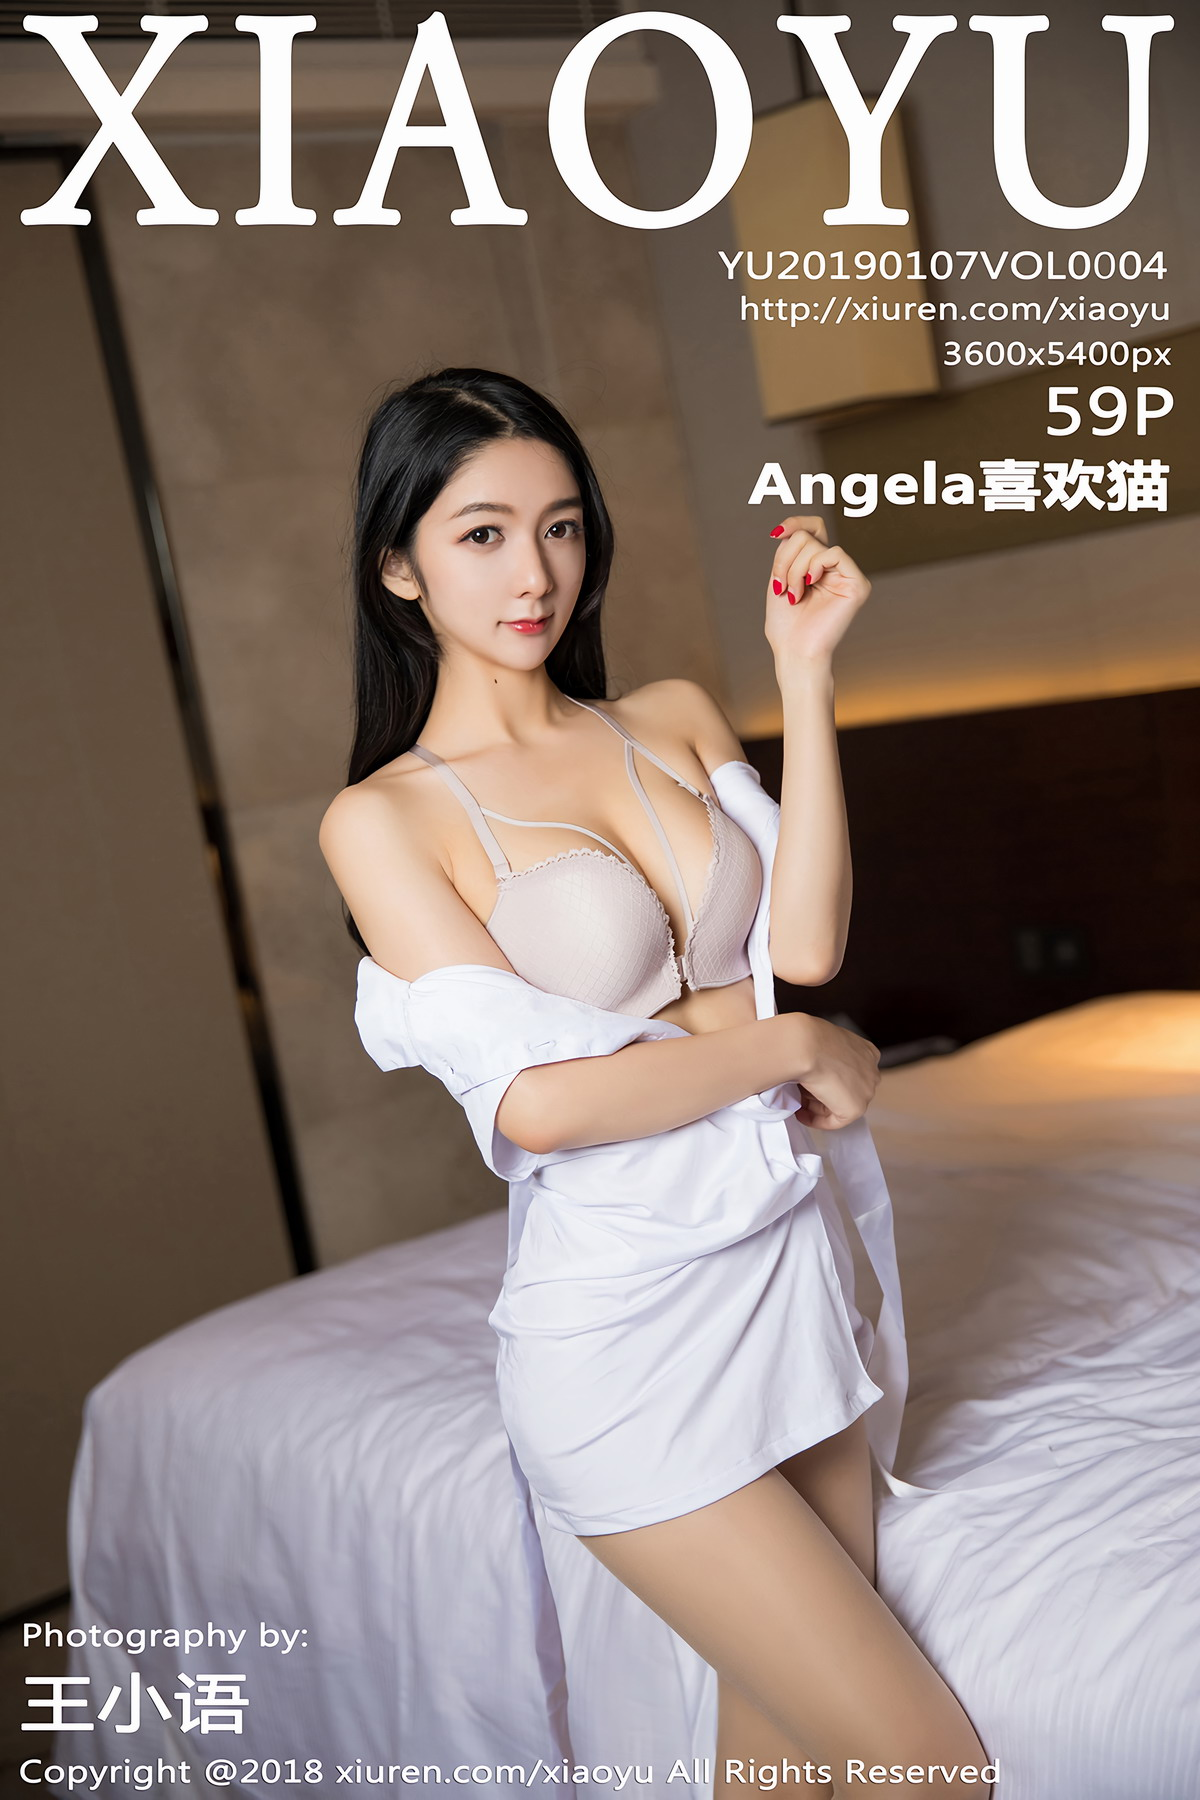 [XIAOYU语画界]2019.01.07 VOL.004 Angela喜欢猫[/192MB]